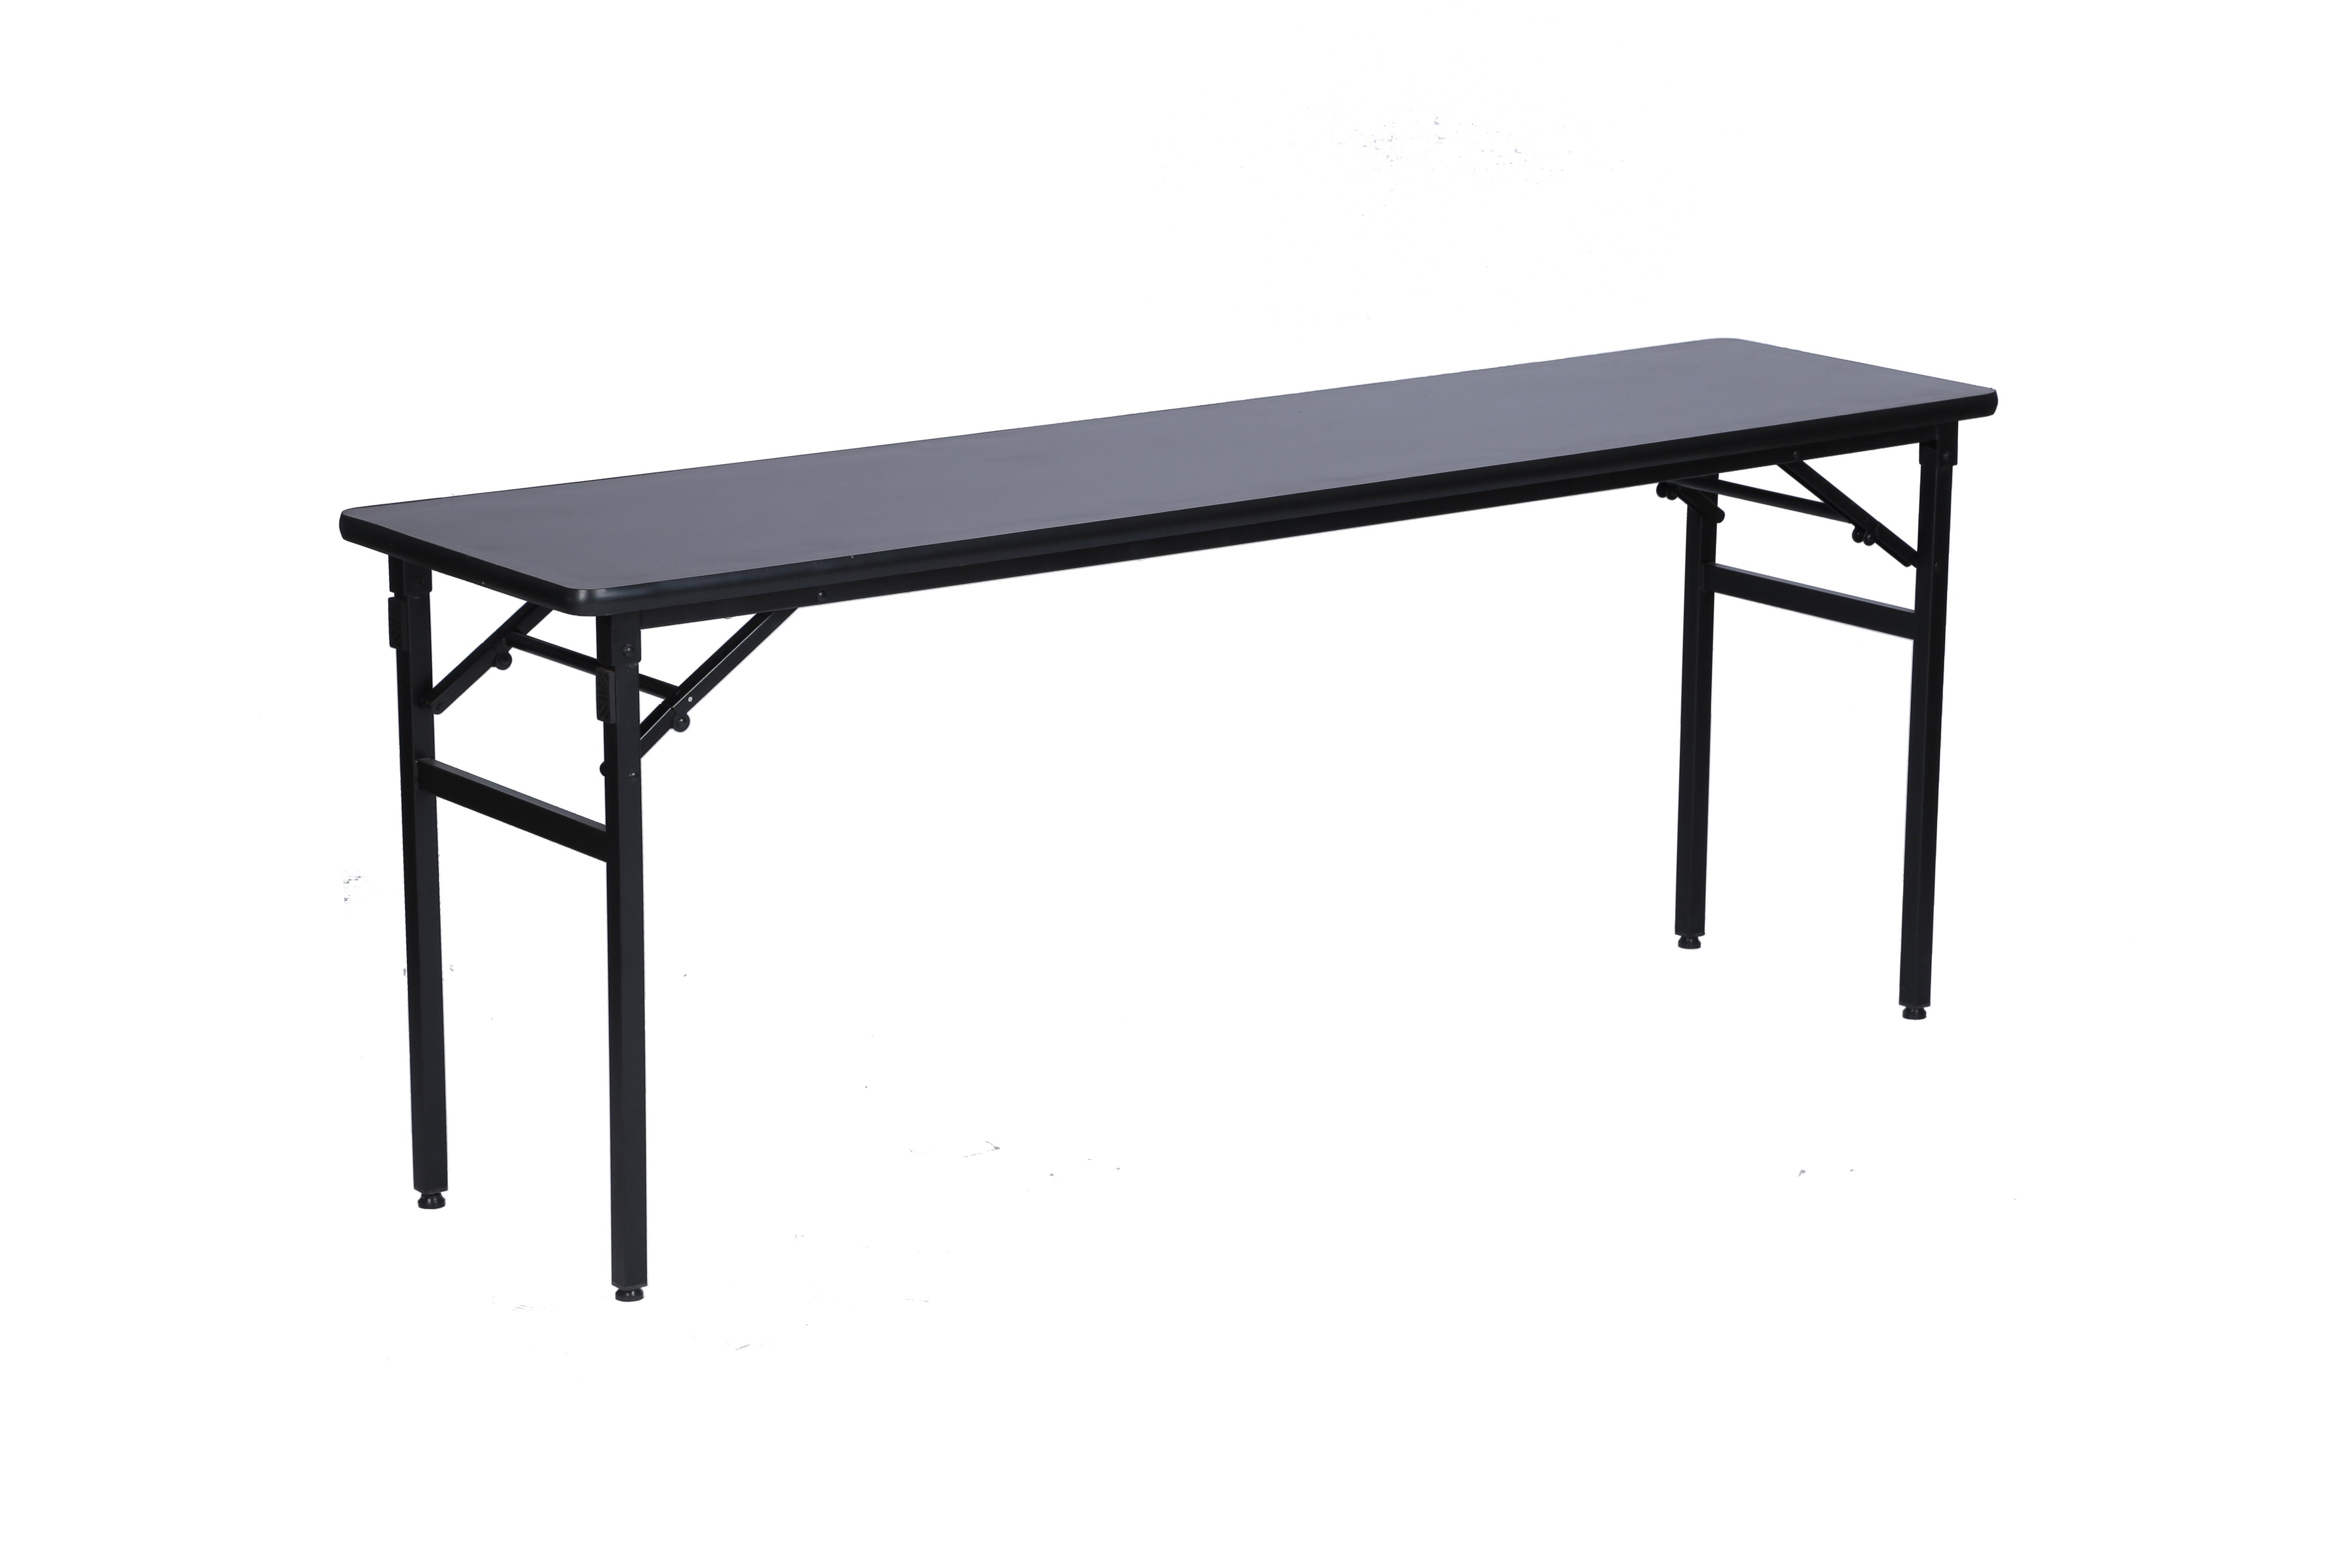 HoneyComb Light Weight Folding Table